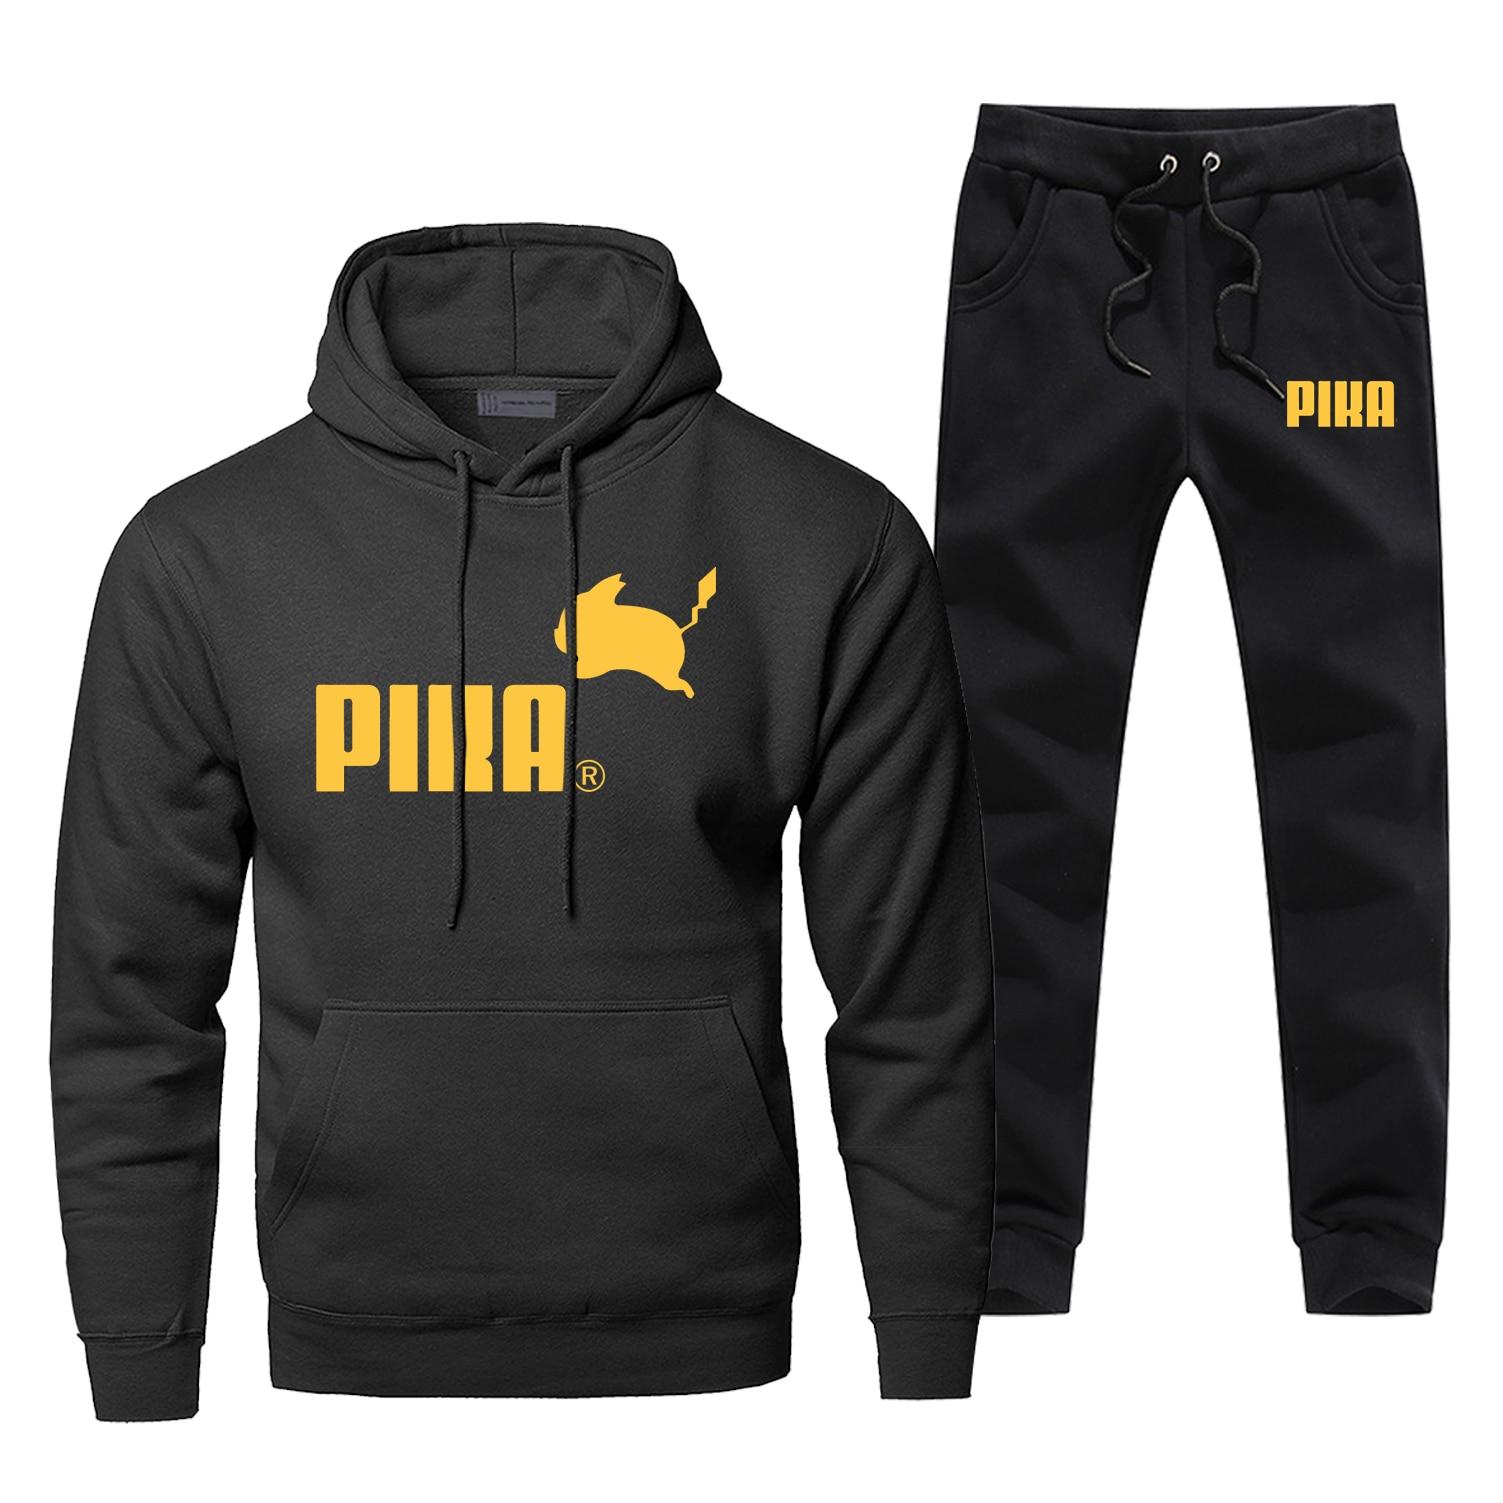 Pika Men Hoodie Male Pants Set Pikachu Sweatshirt Mens Japan Anime Hoodies Sweatshirts Sets Two Piece Pant Pullover 2Pcs Coat